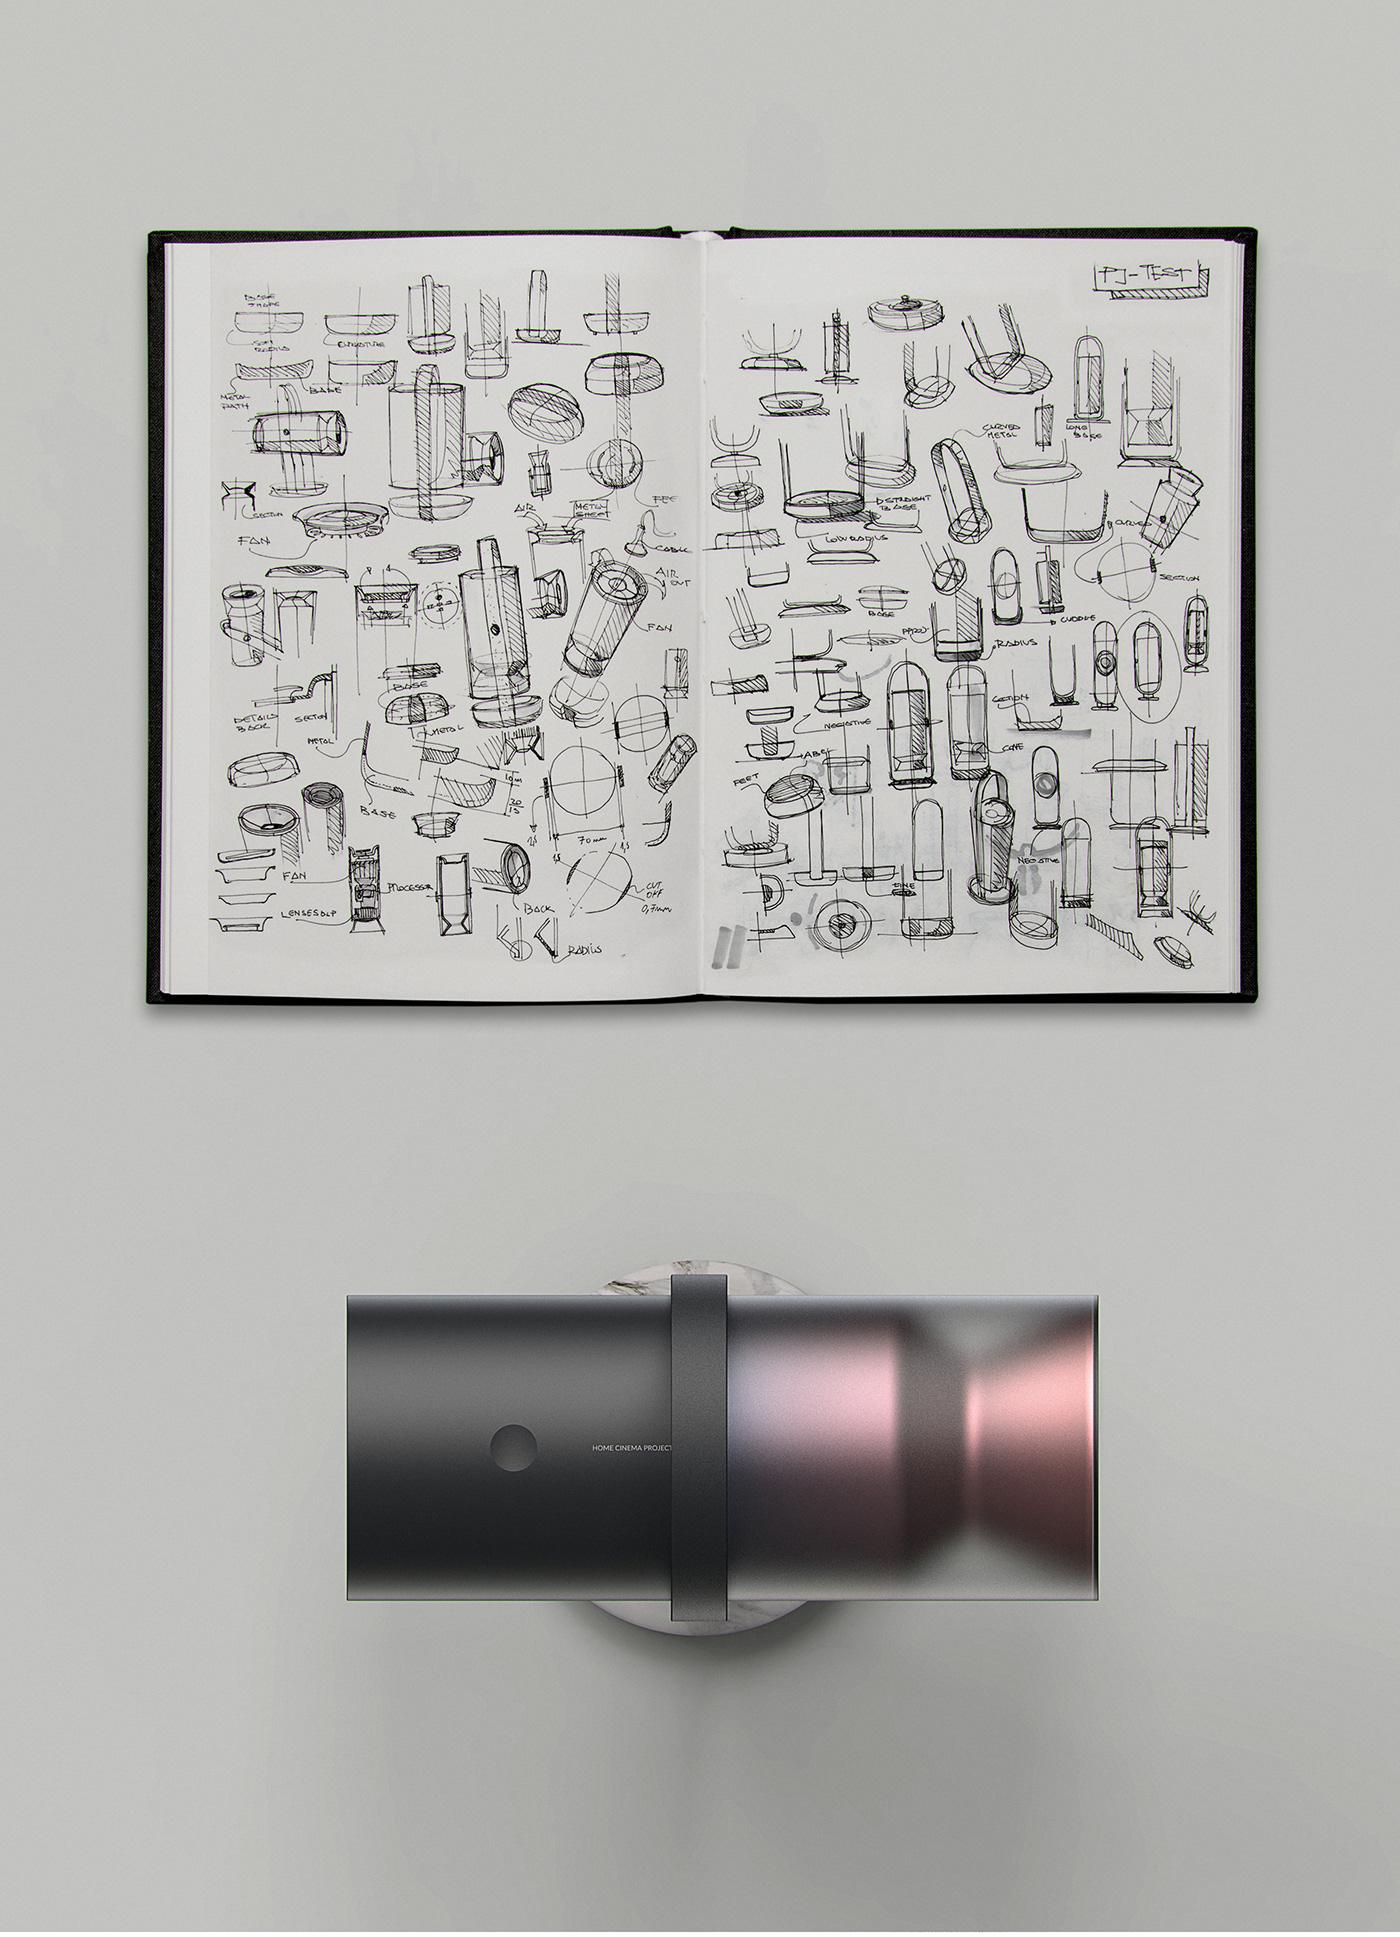 Projector projectors product design  industrial design  light wireless Smart clean minimal design